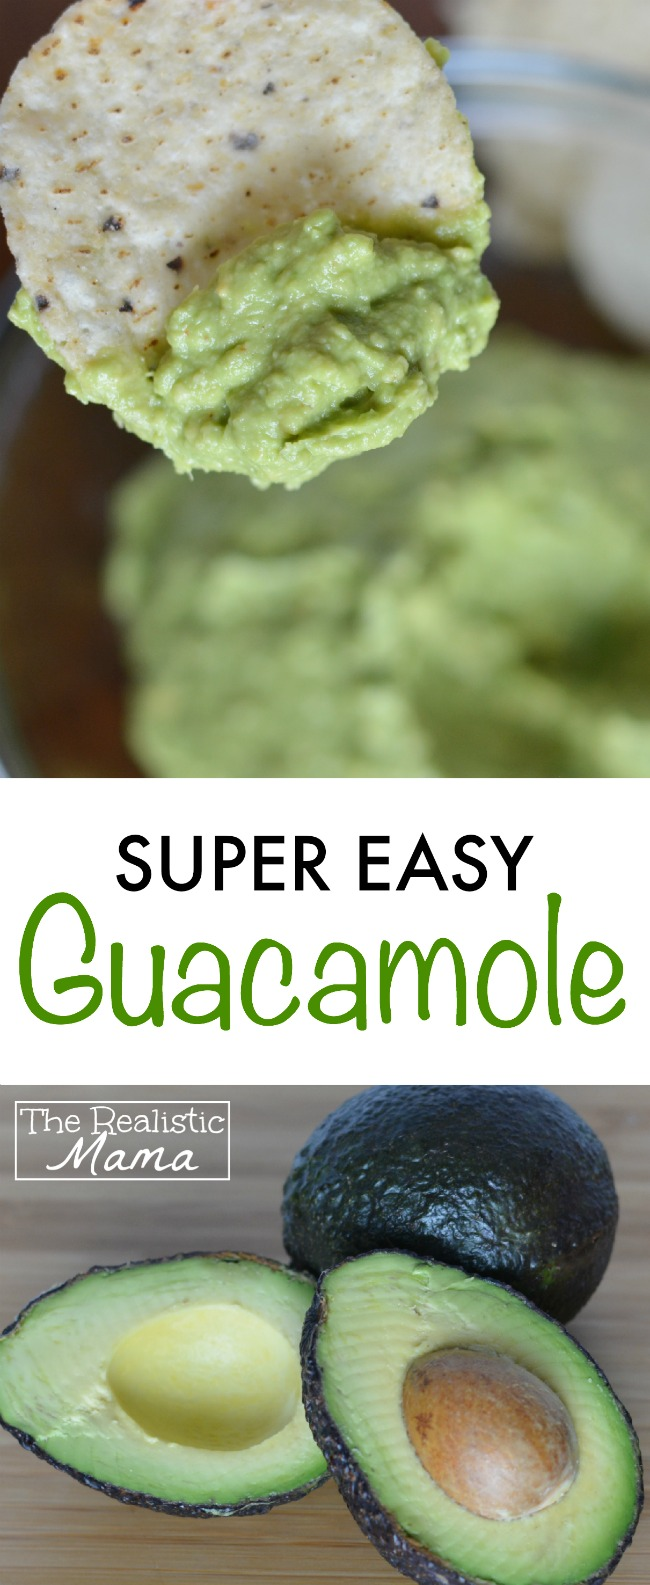 Super Easy Guacamole Recipe